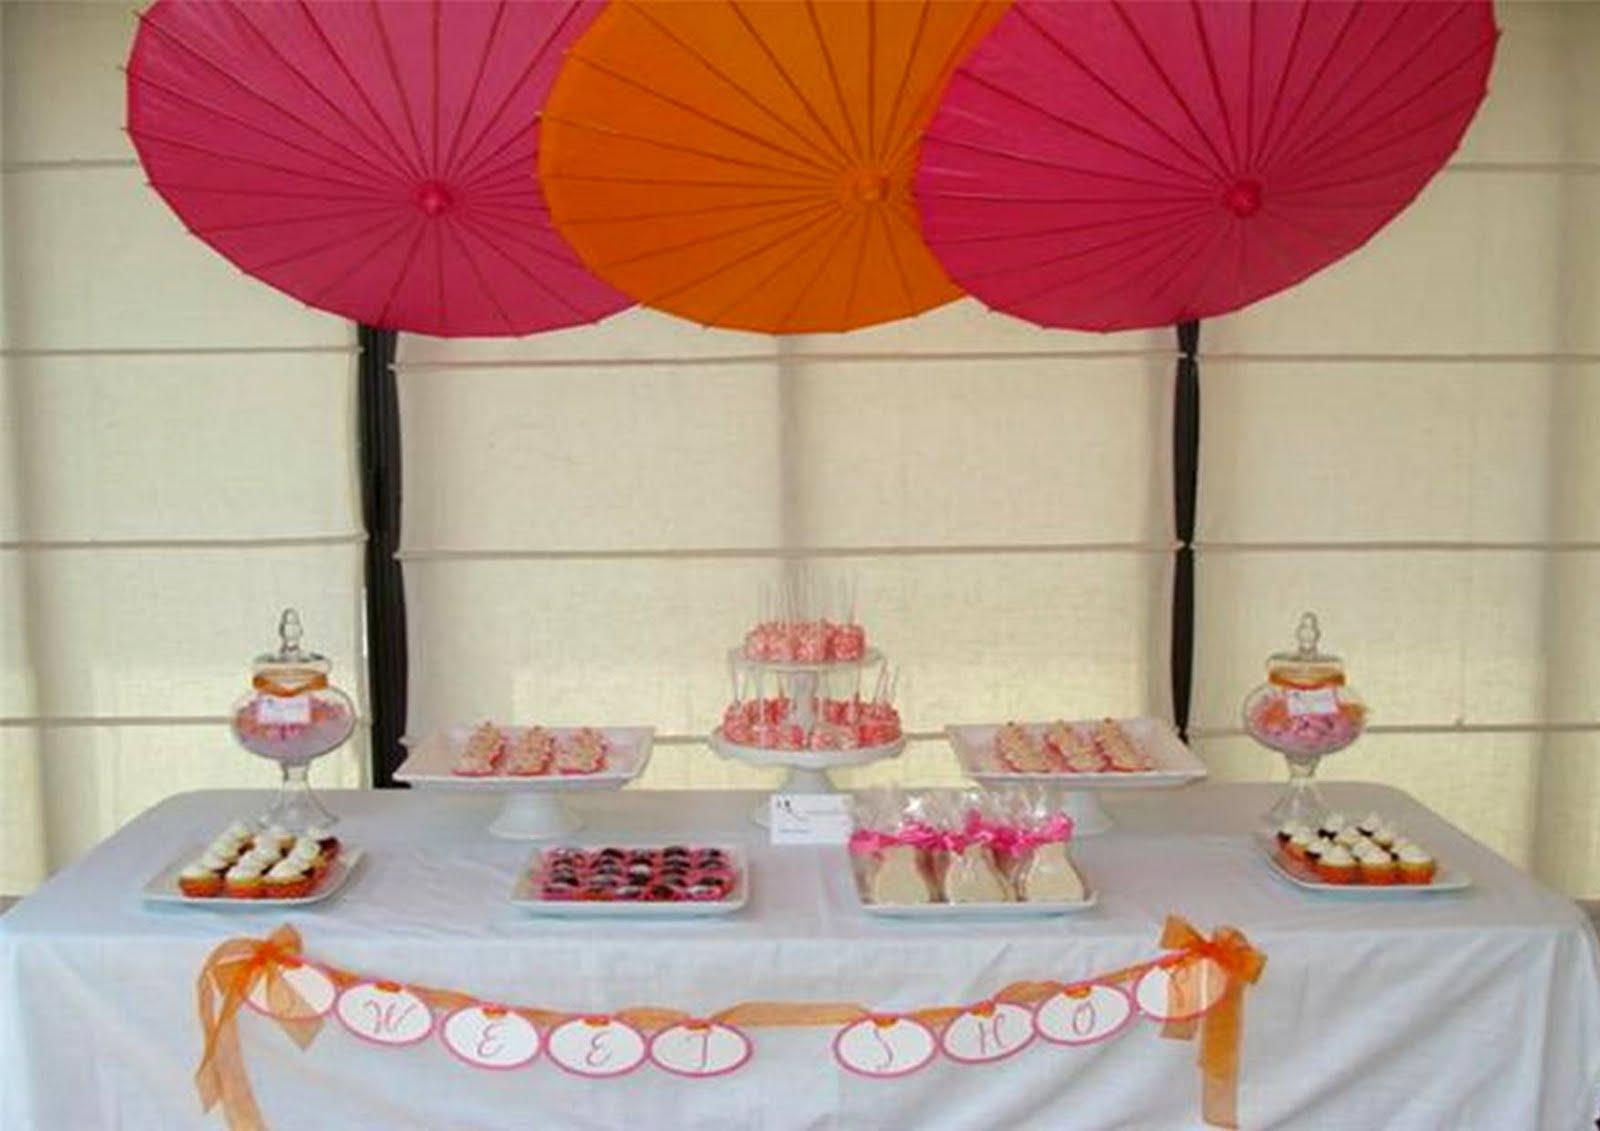 Icing Designs: Pink and Orange Bridal Shower